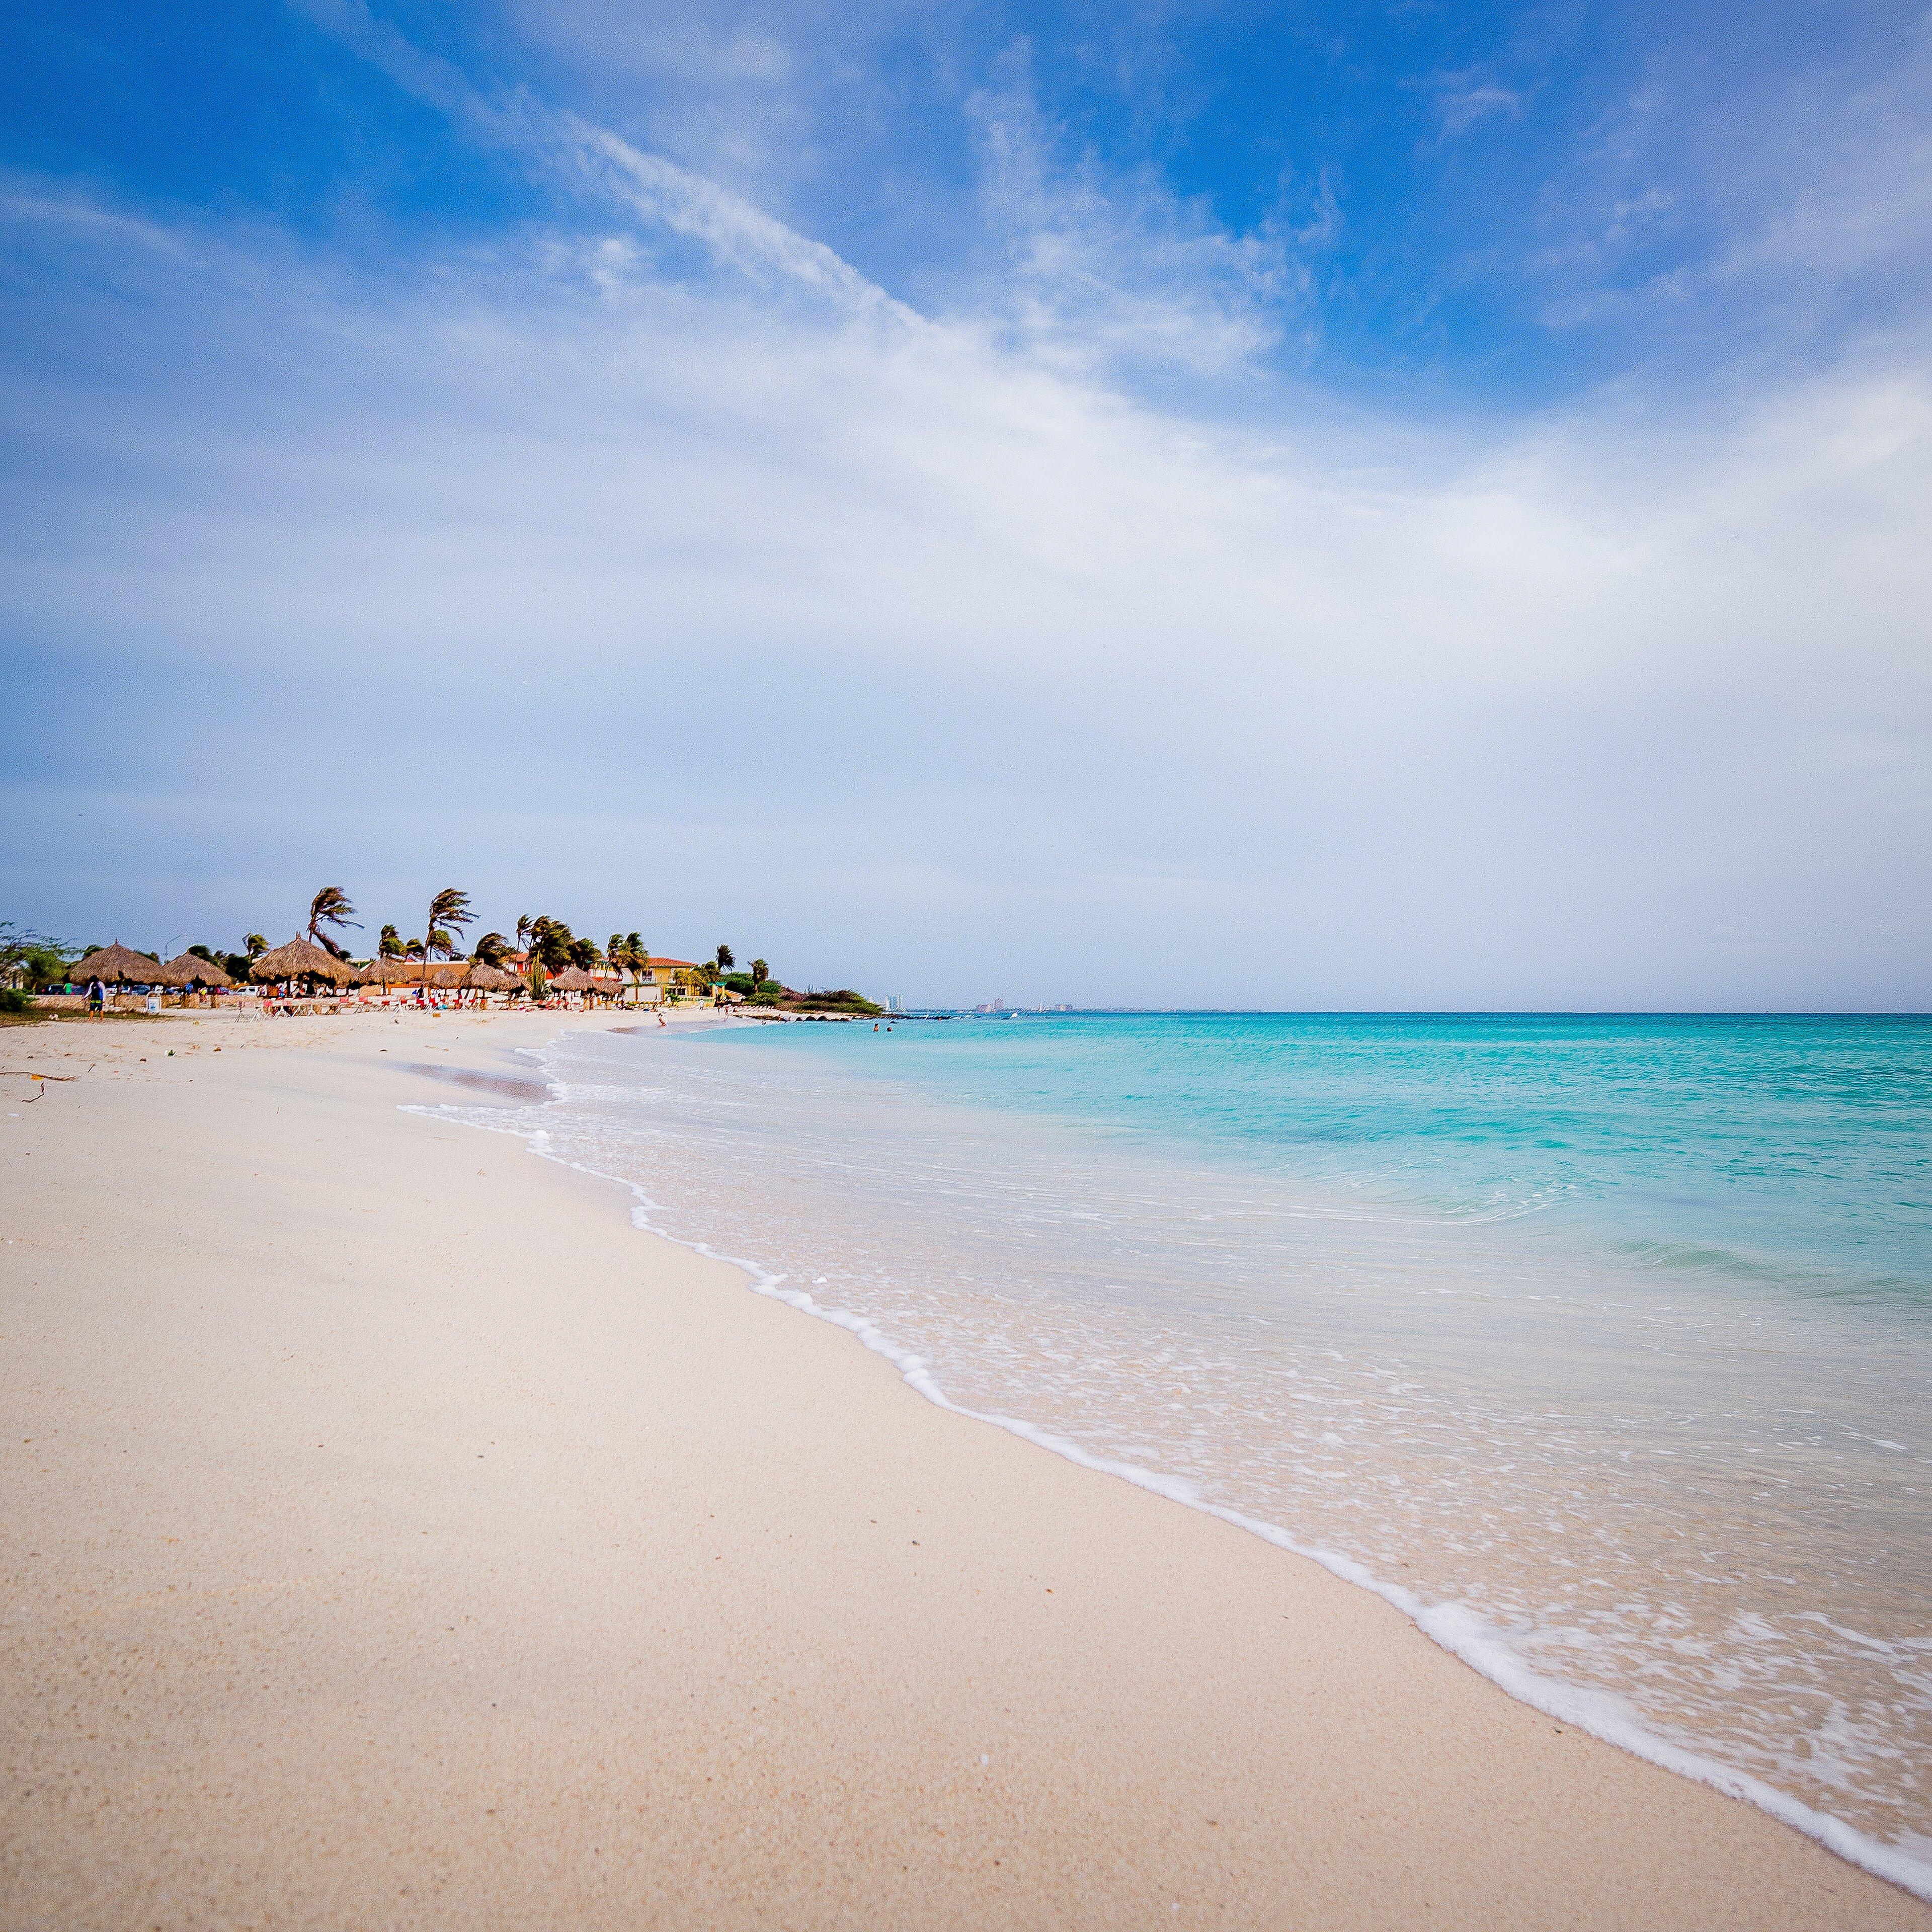 Arashi Beach, Aruba - Best Snorkeling Beach in the Caribbean